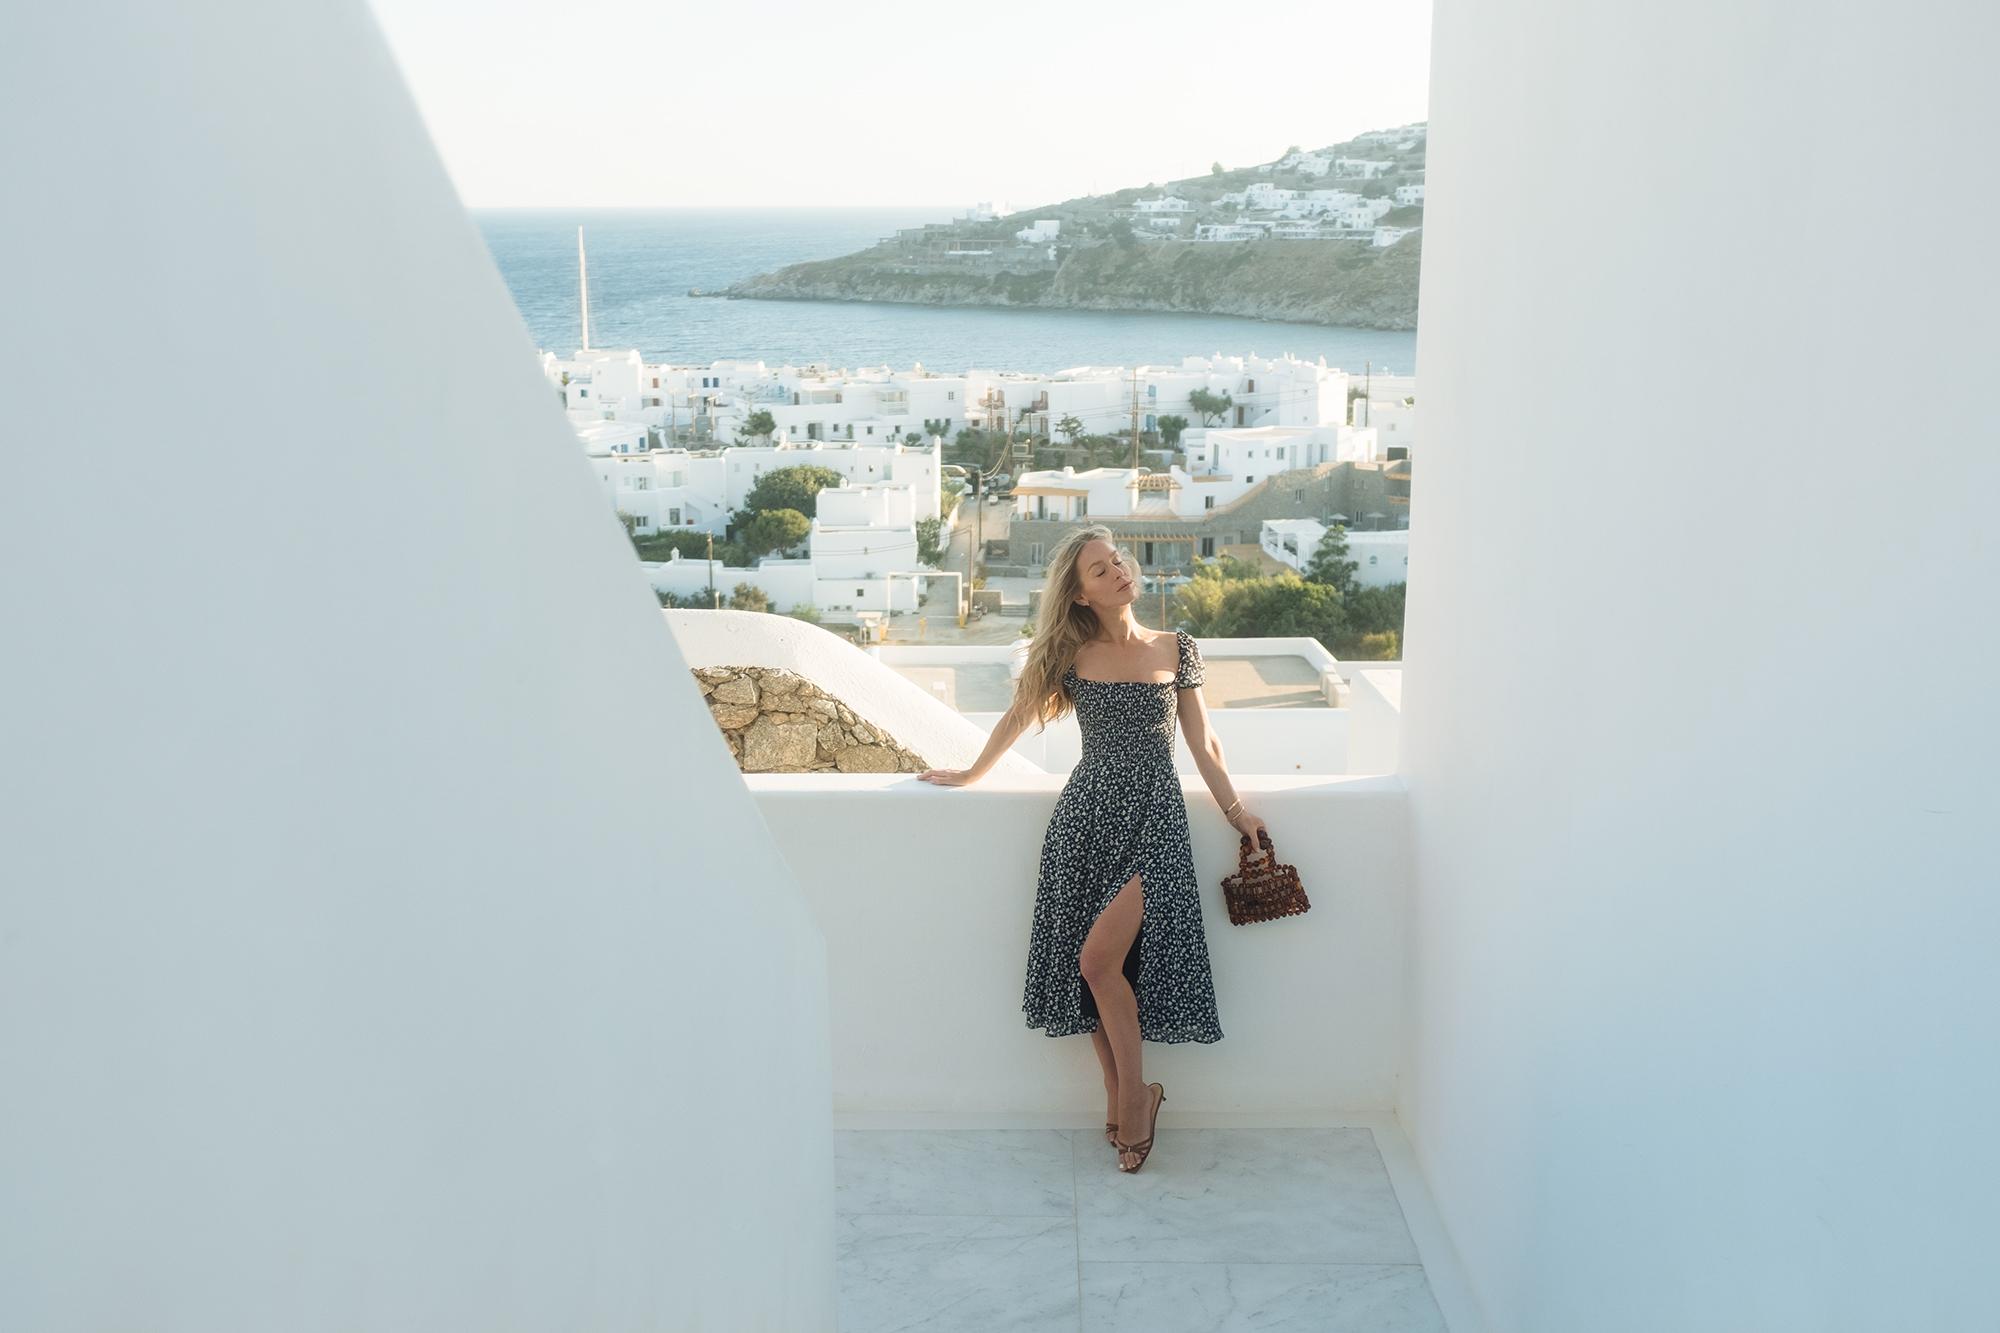 Greece_Carin_Olsson_01.jpg